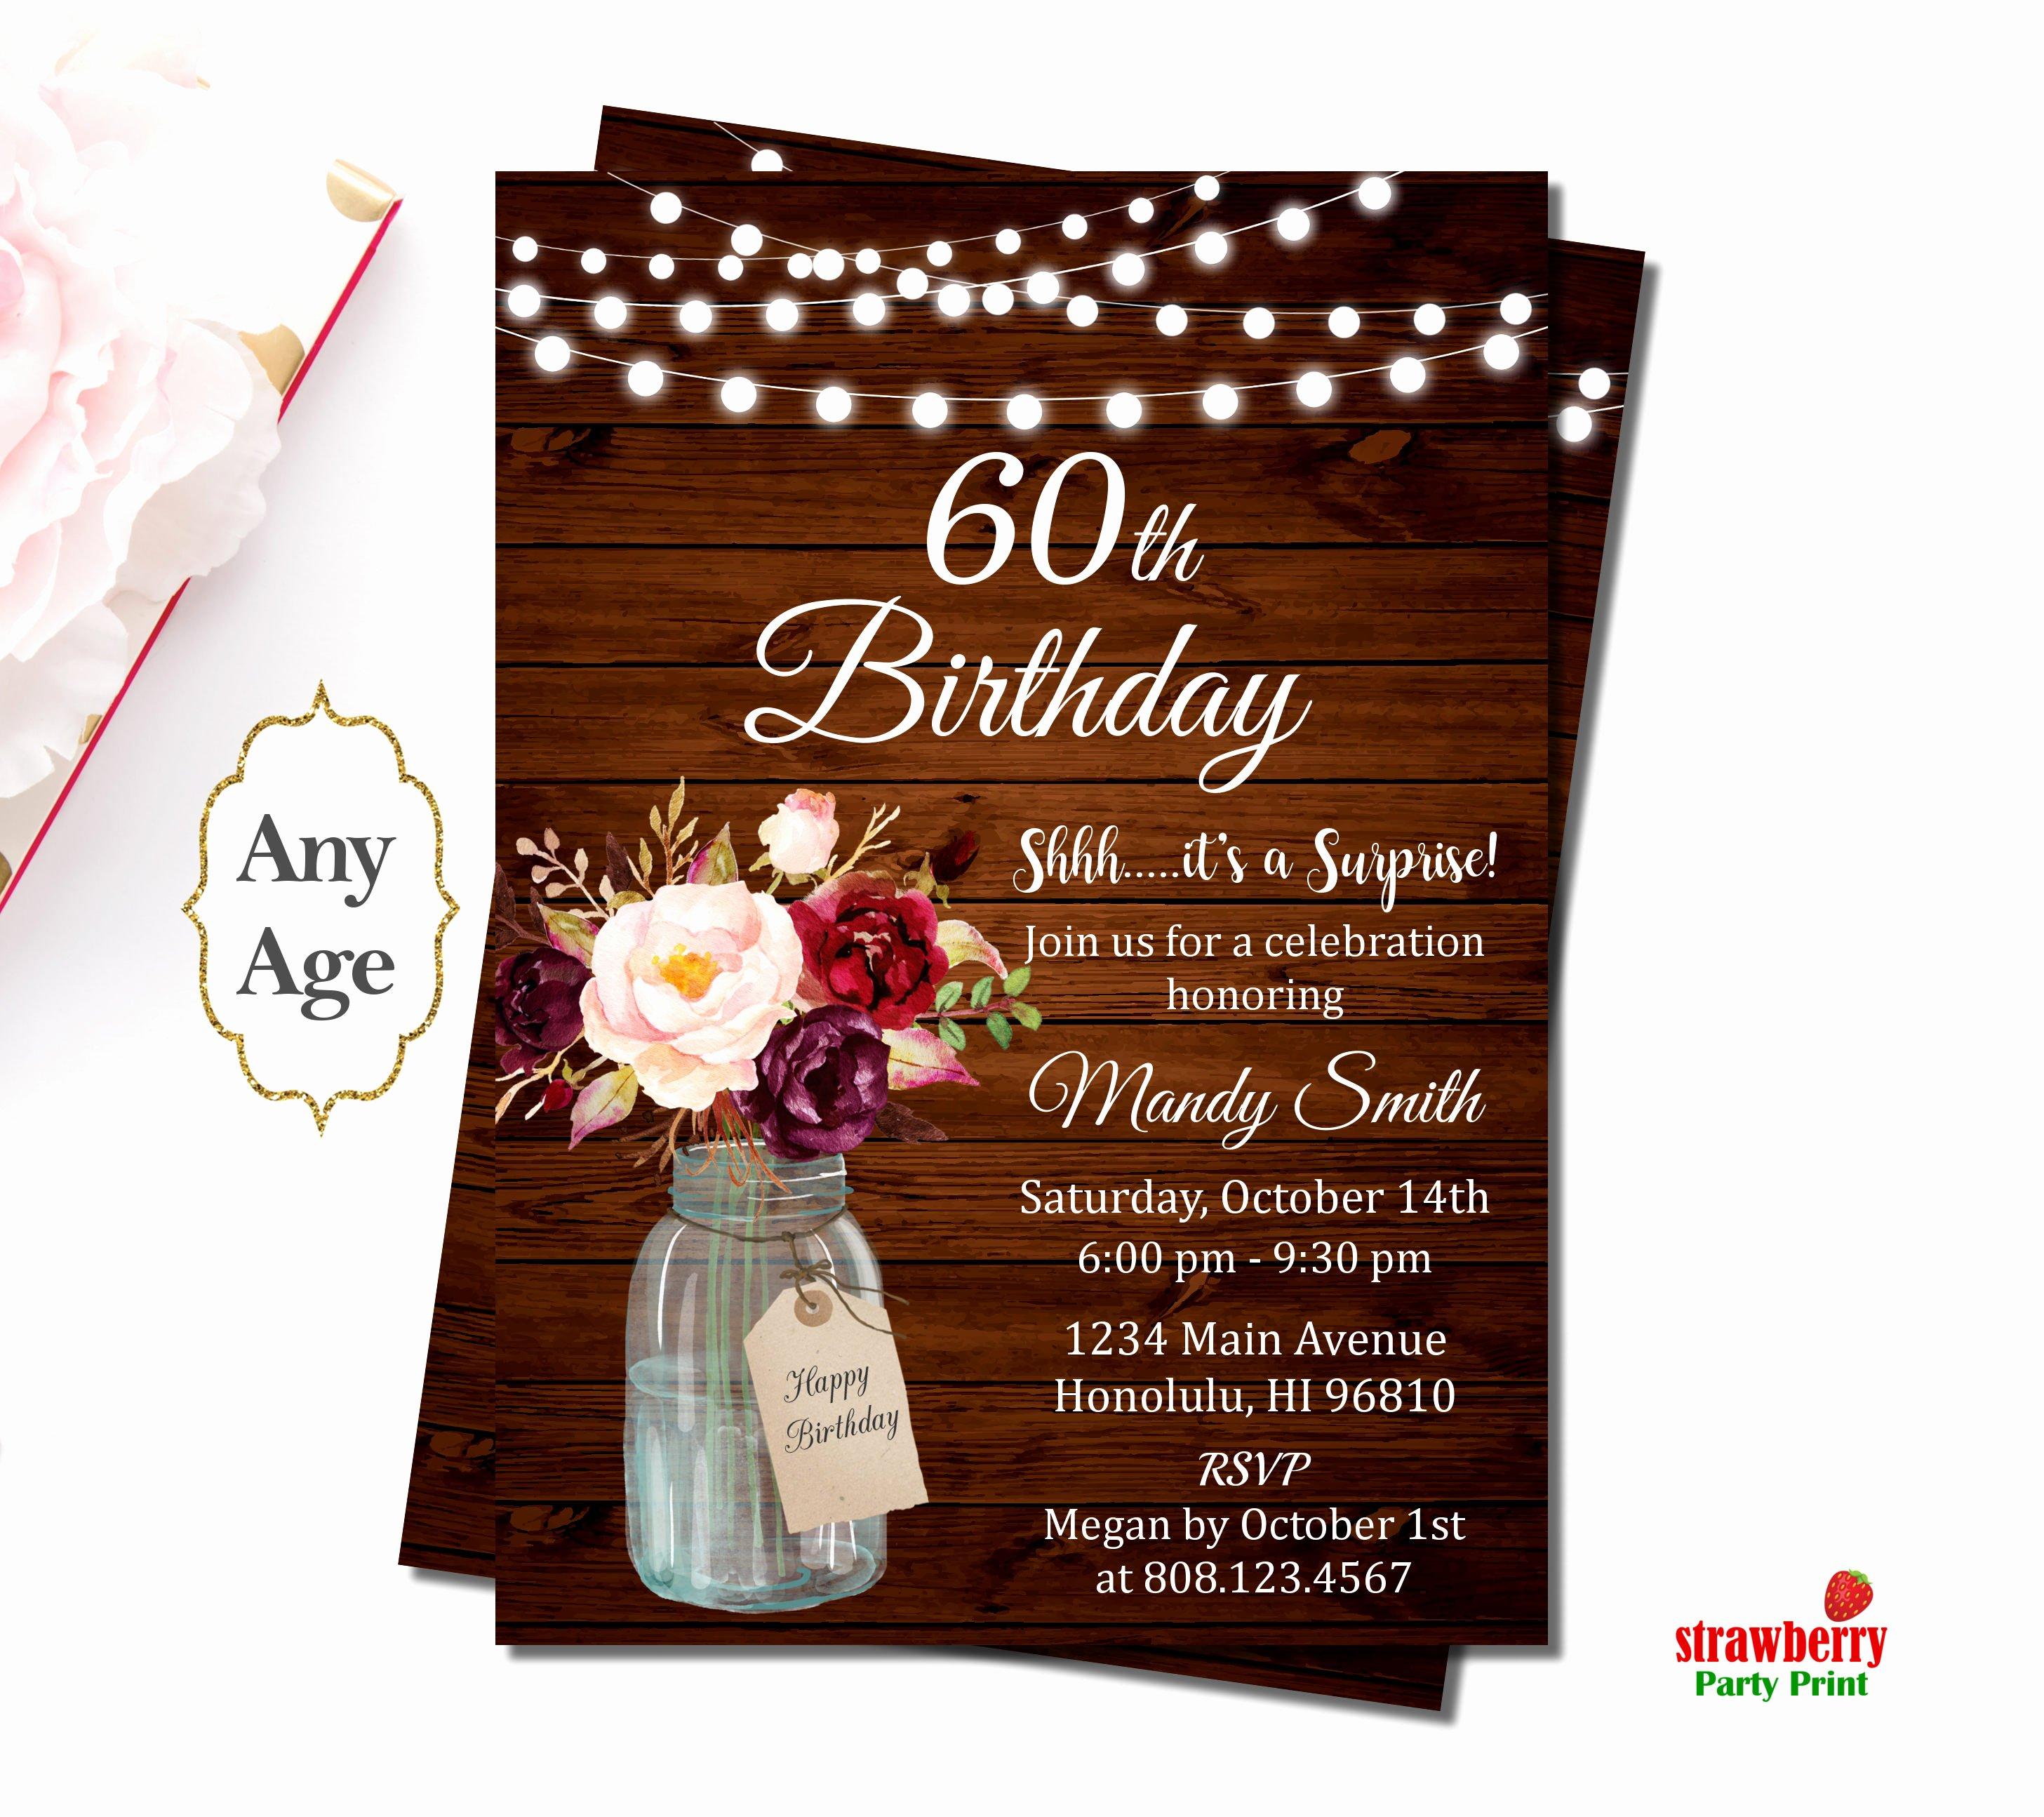 60 Th Birthday Invitation Elegant 60th Birthday Invitations for Women Surprise 60th Birthday